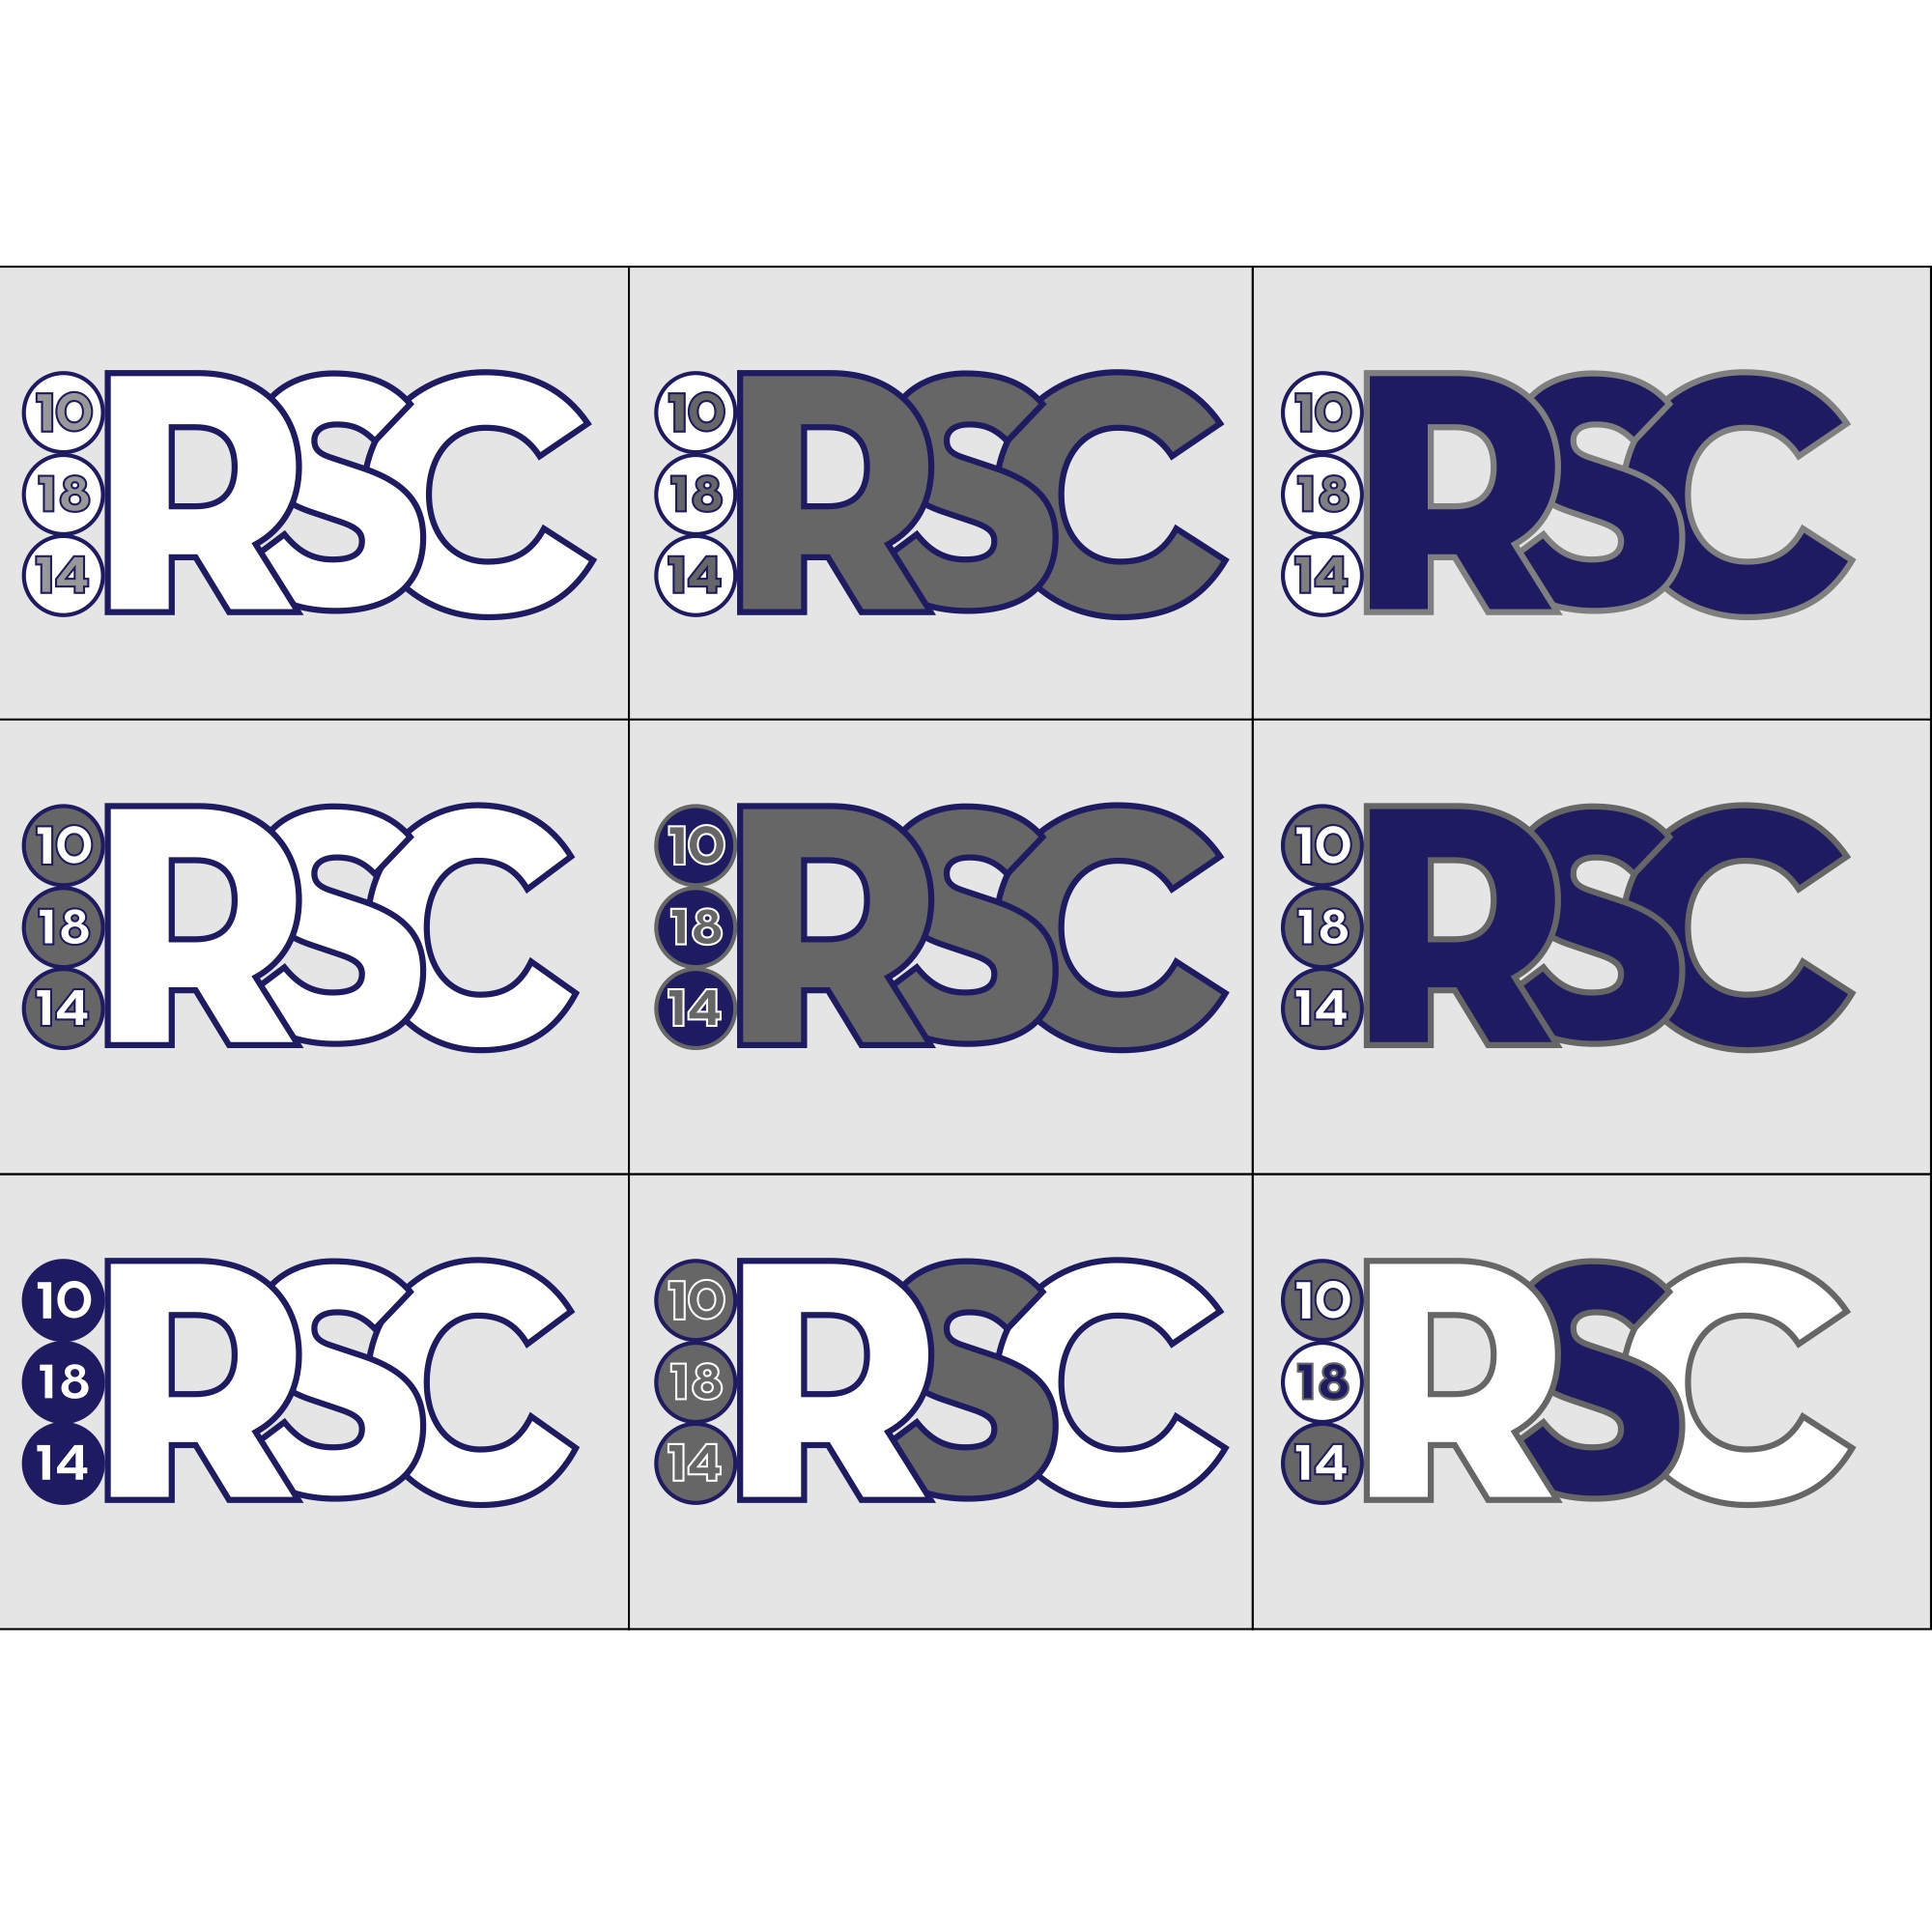 Boys logo color variations